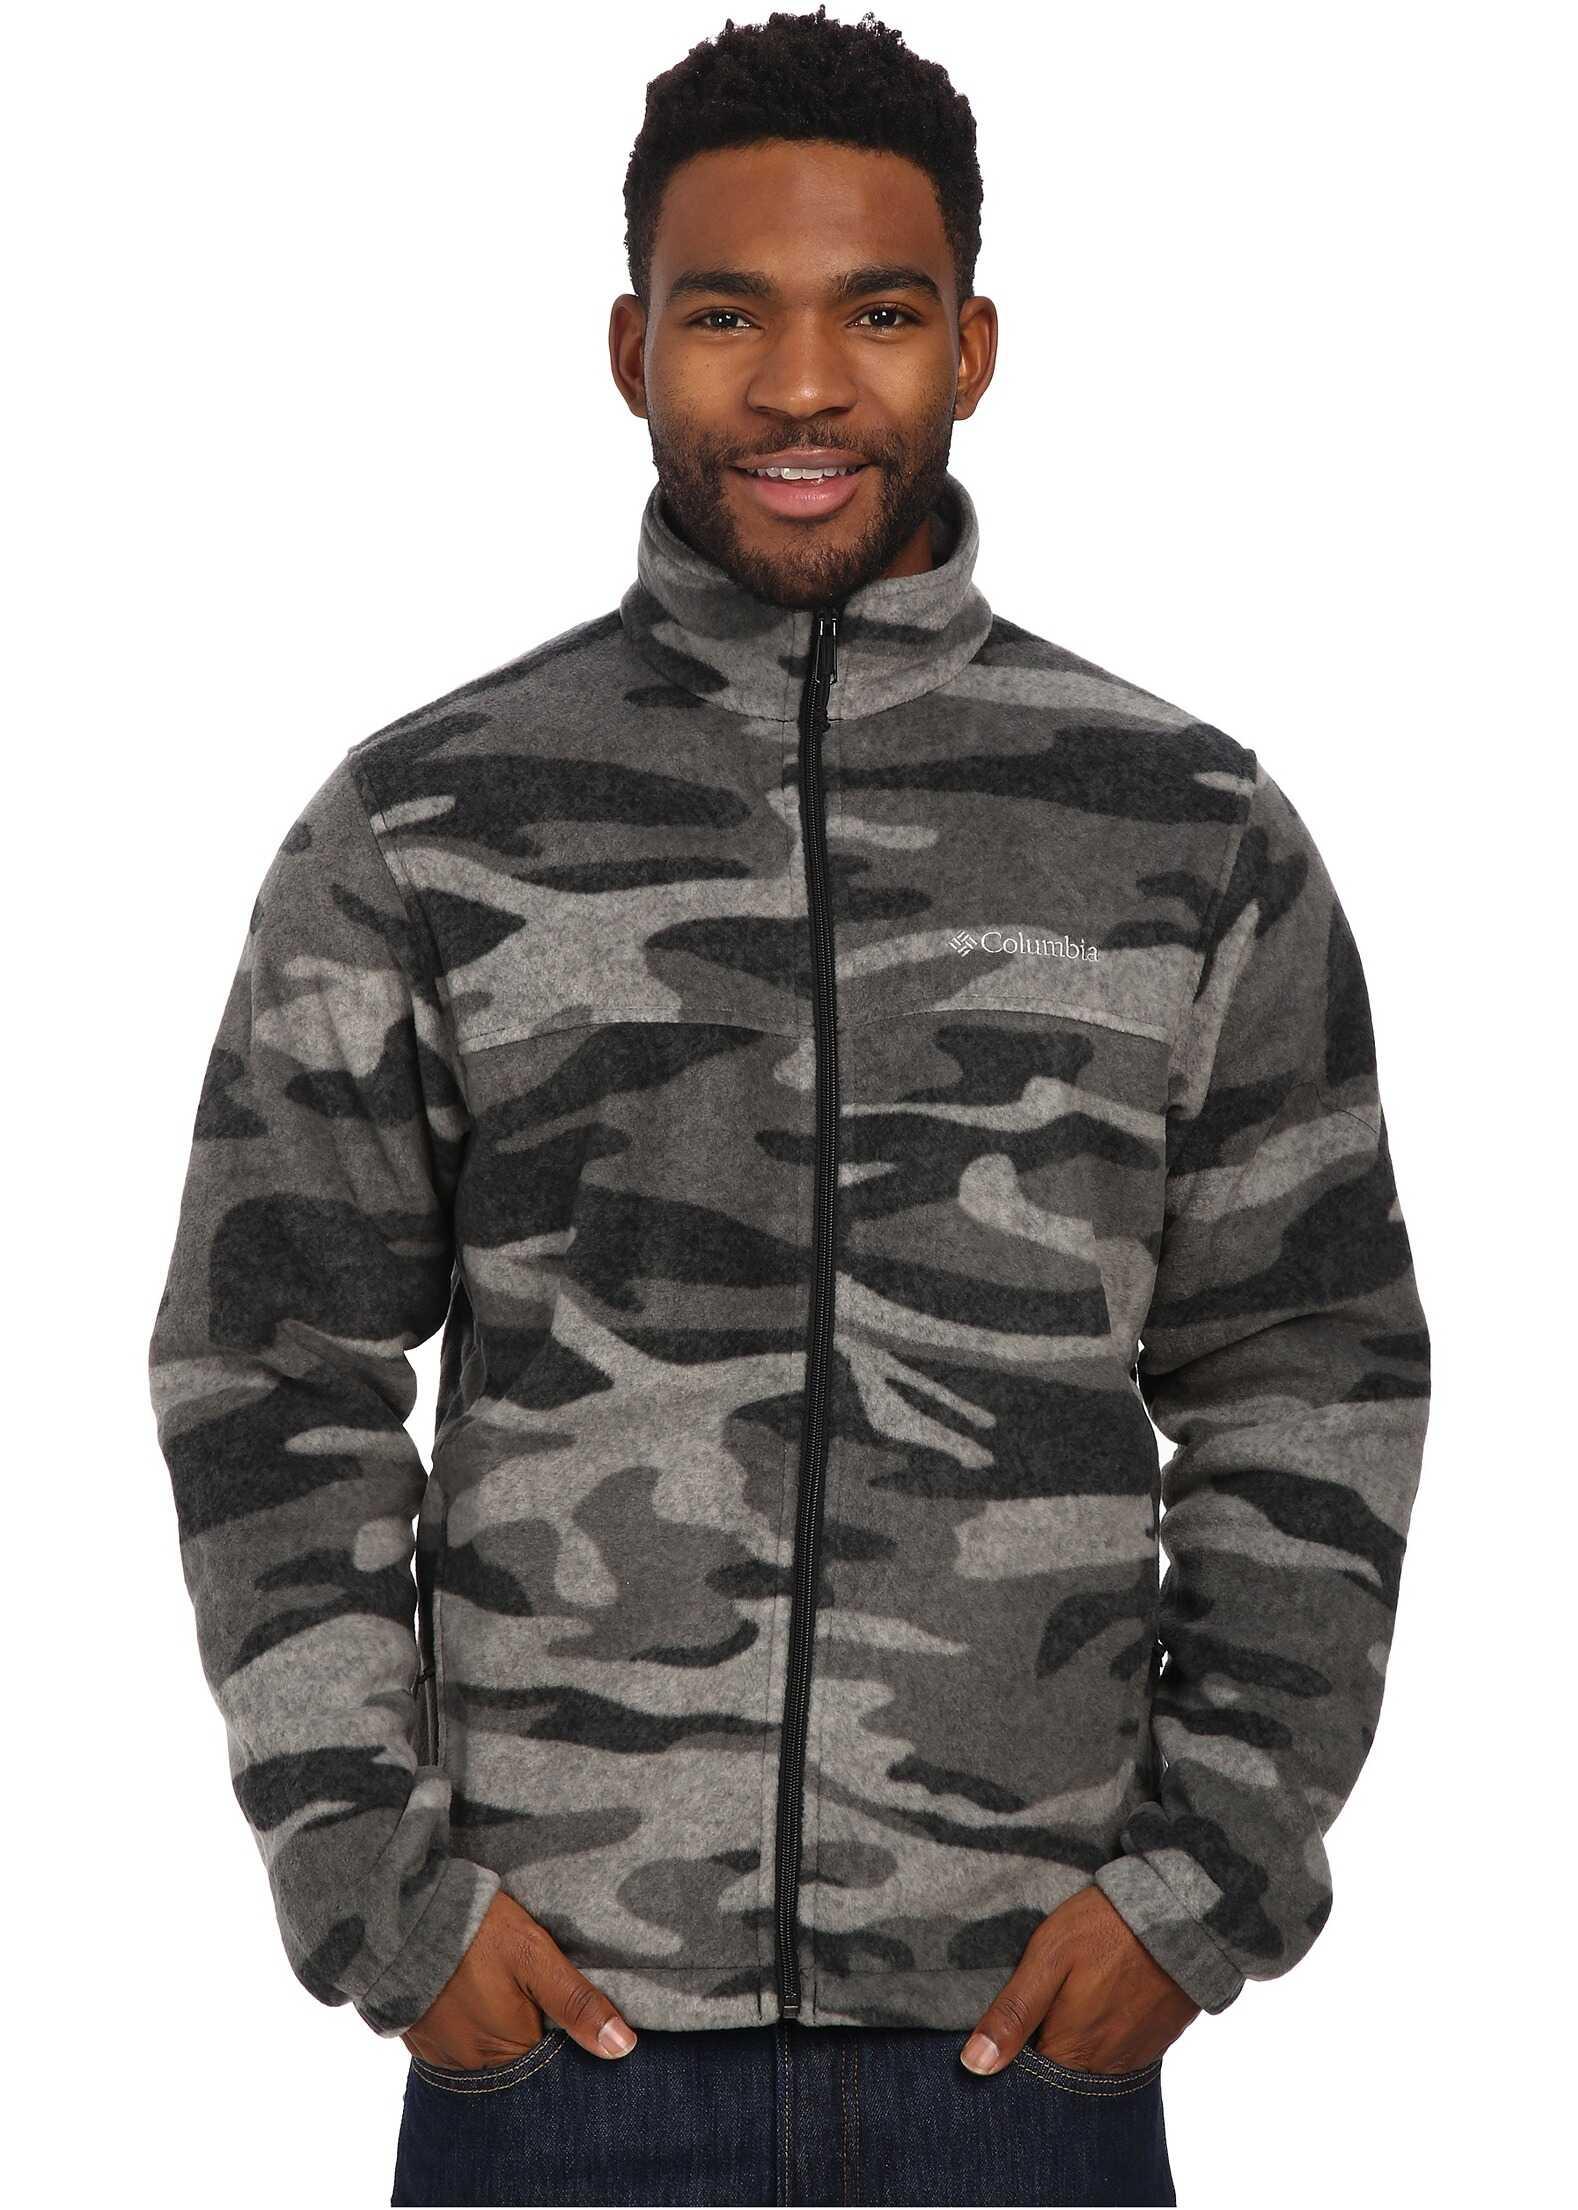 Columbia Steens Mountain™ Print Jacket Black Tweed Camo